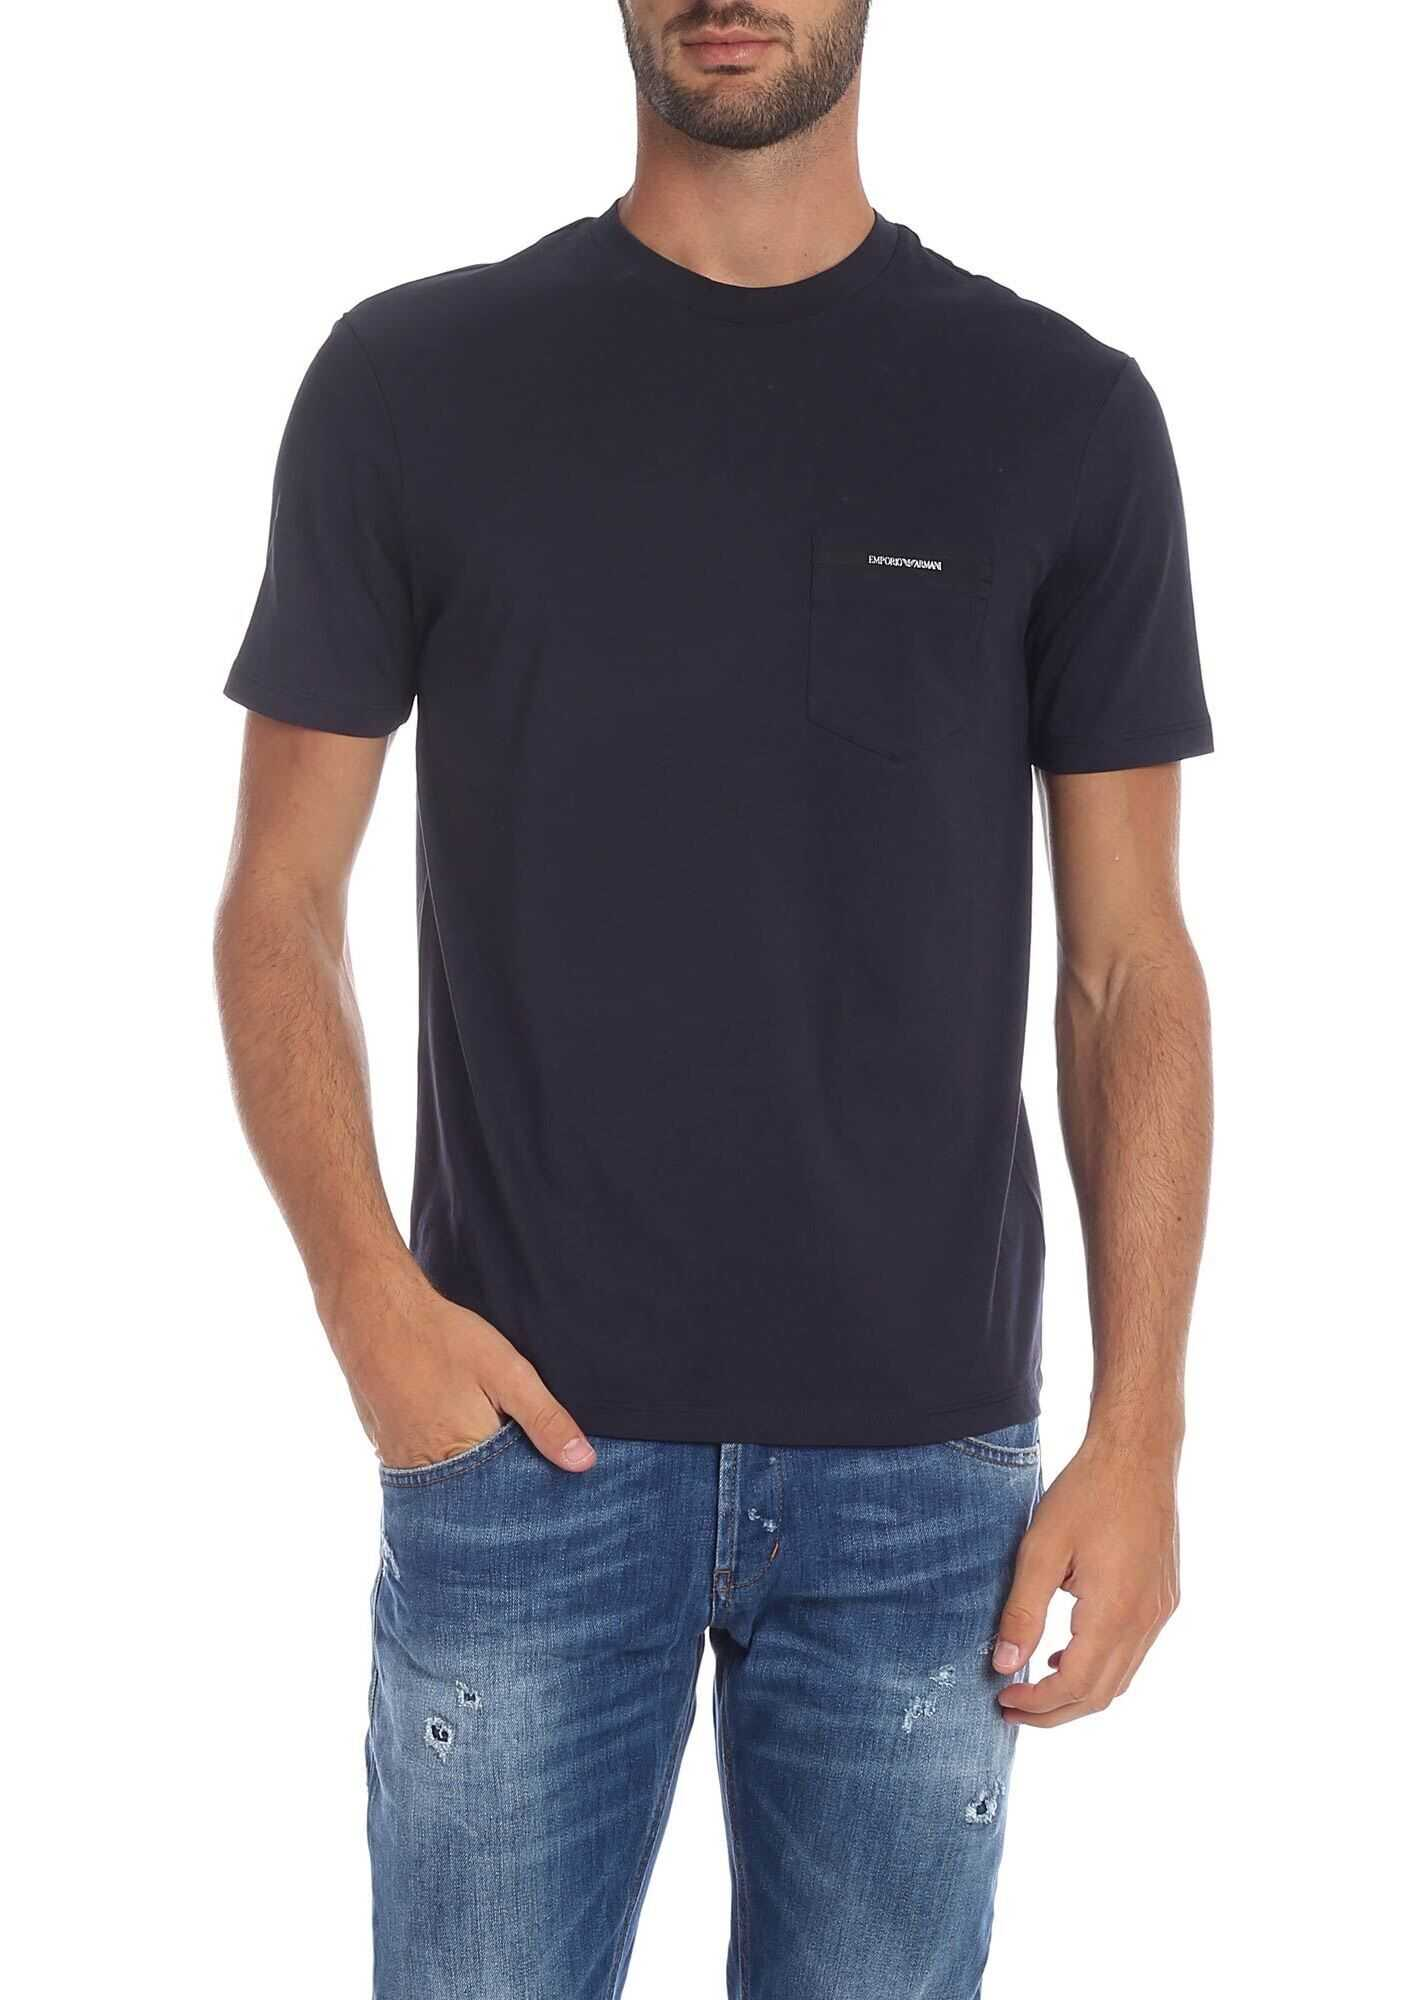 Emporio Armani Blue T-Shirt With Pocket Blue